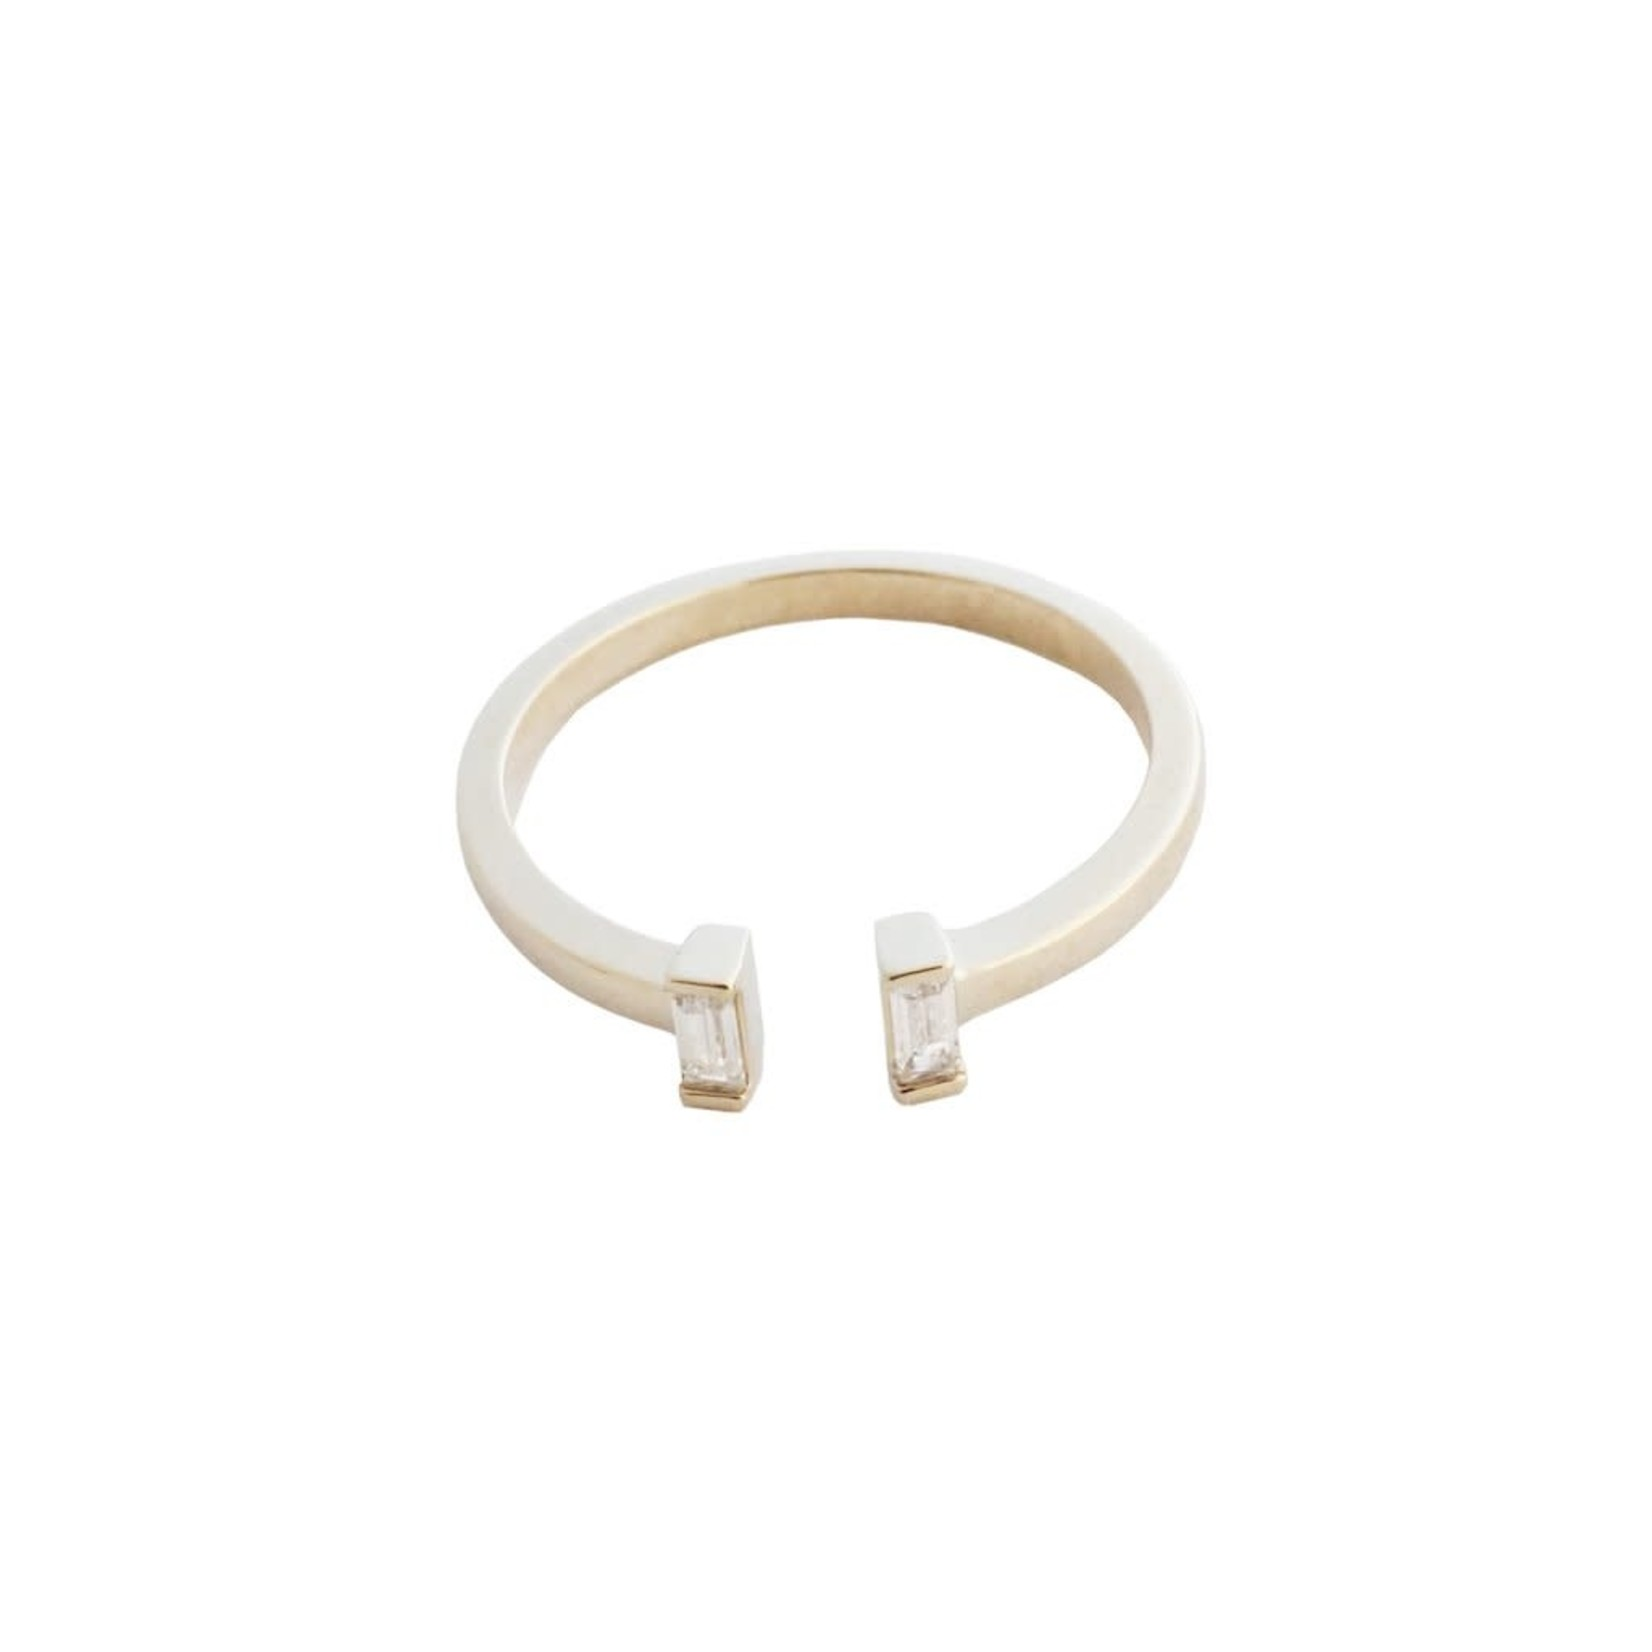 Honeycat Jewelry Honeycat Stevie Baguette Ring